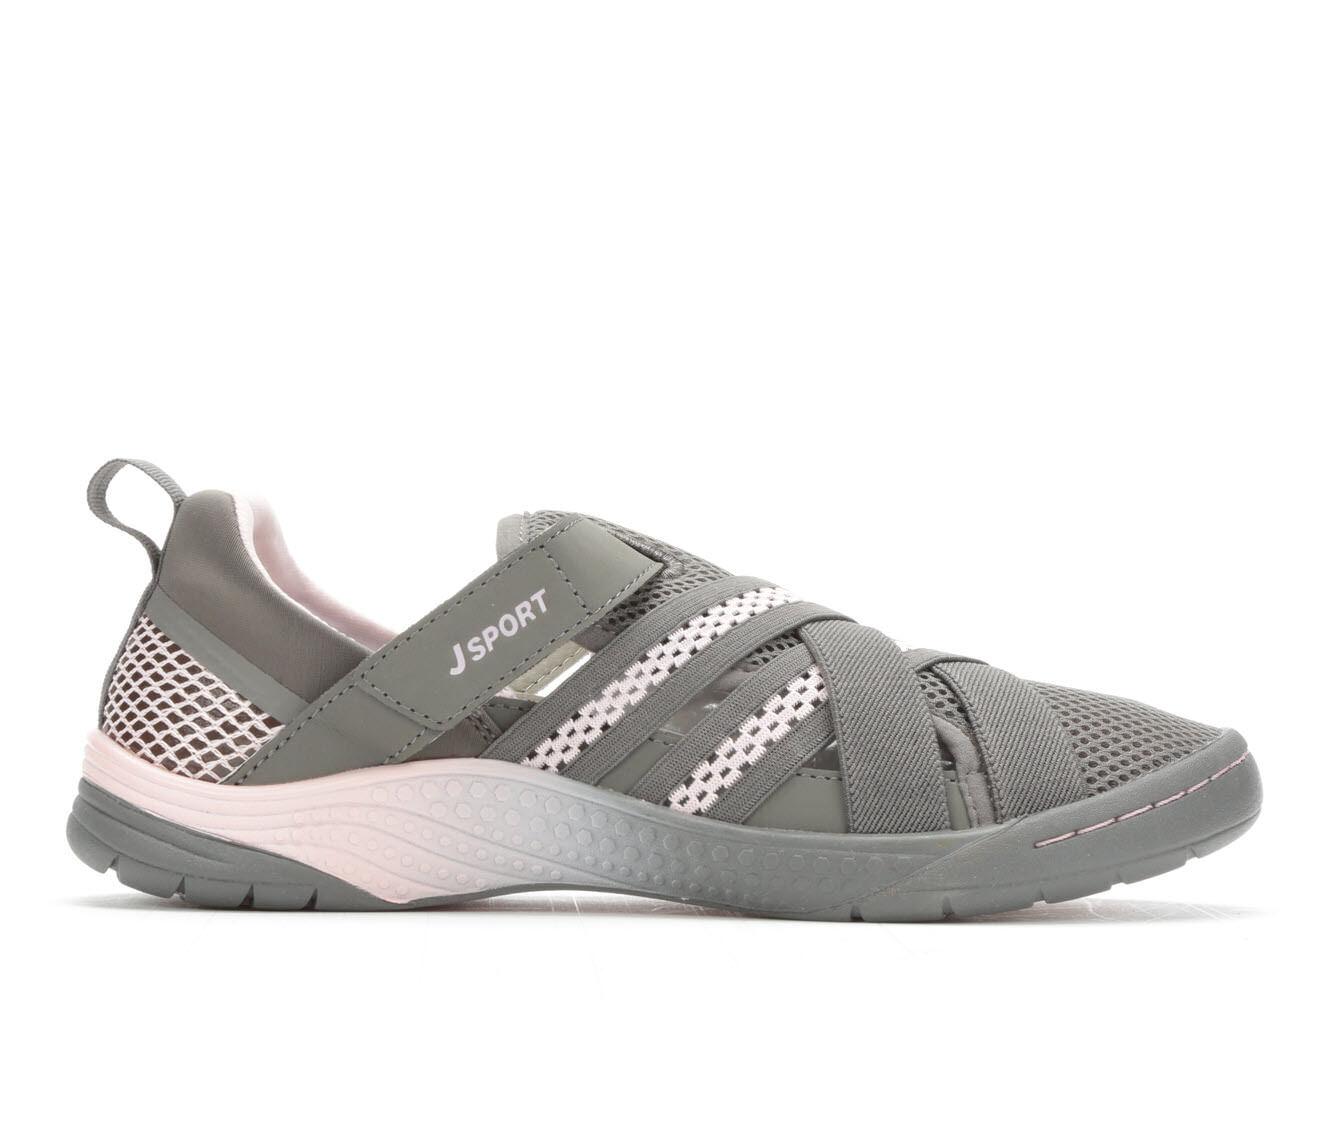 Women's JBU by Jambu Essex Casual Shoes cheap sale best store to get Xaqi2NF